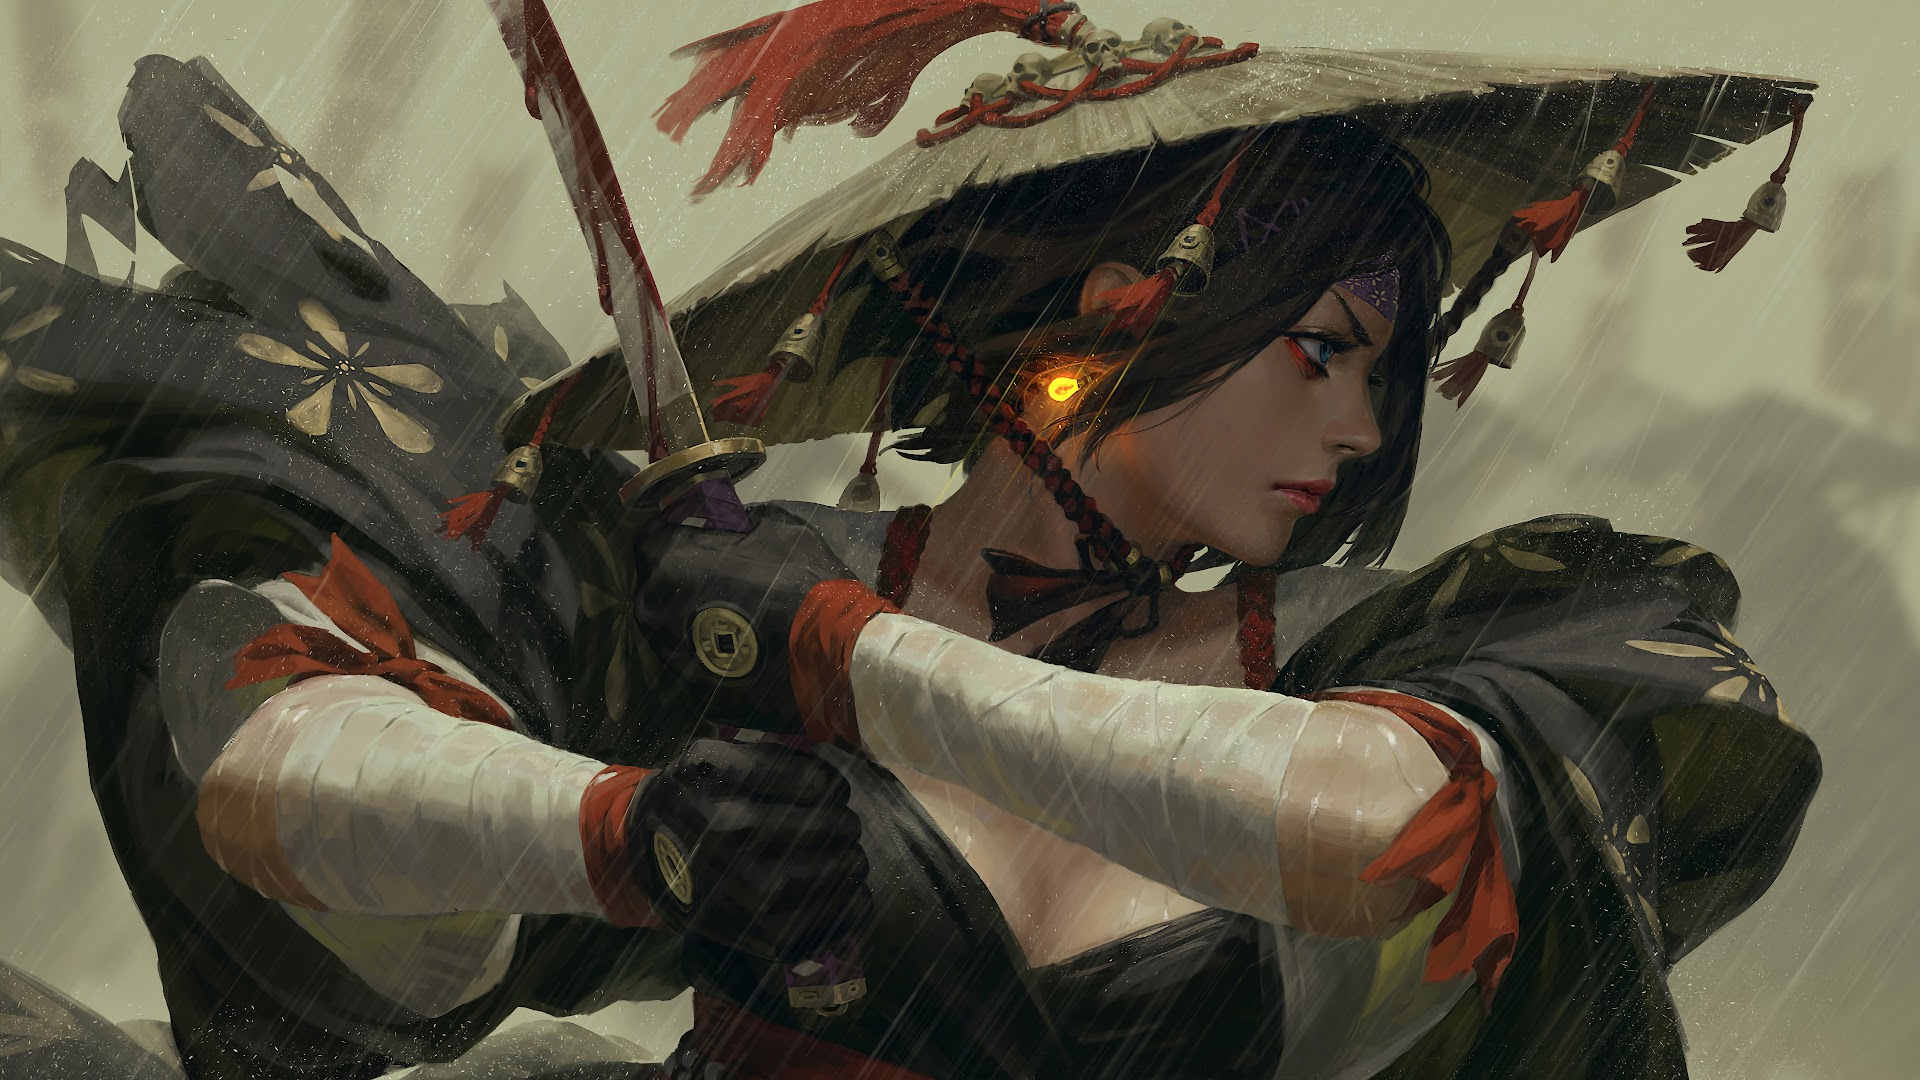 Samurai Girl Katana Fantasy Art 4k Wallpaper 89